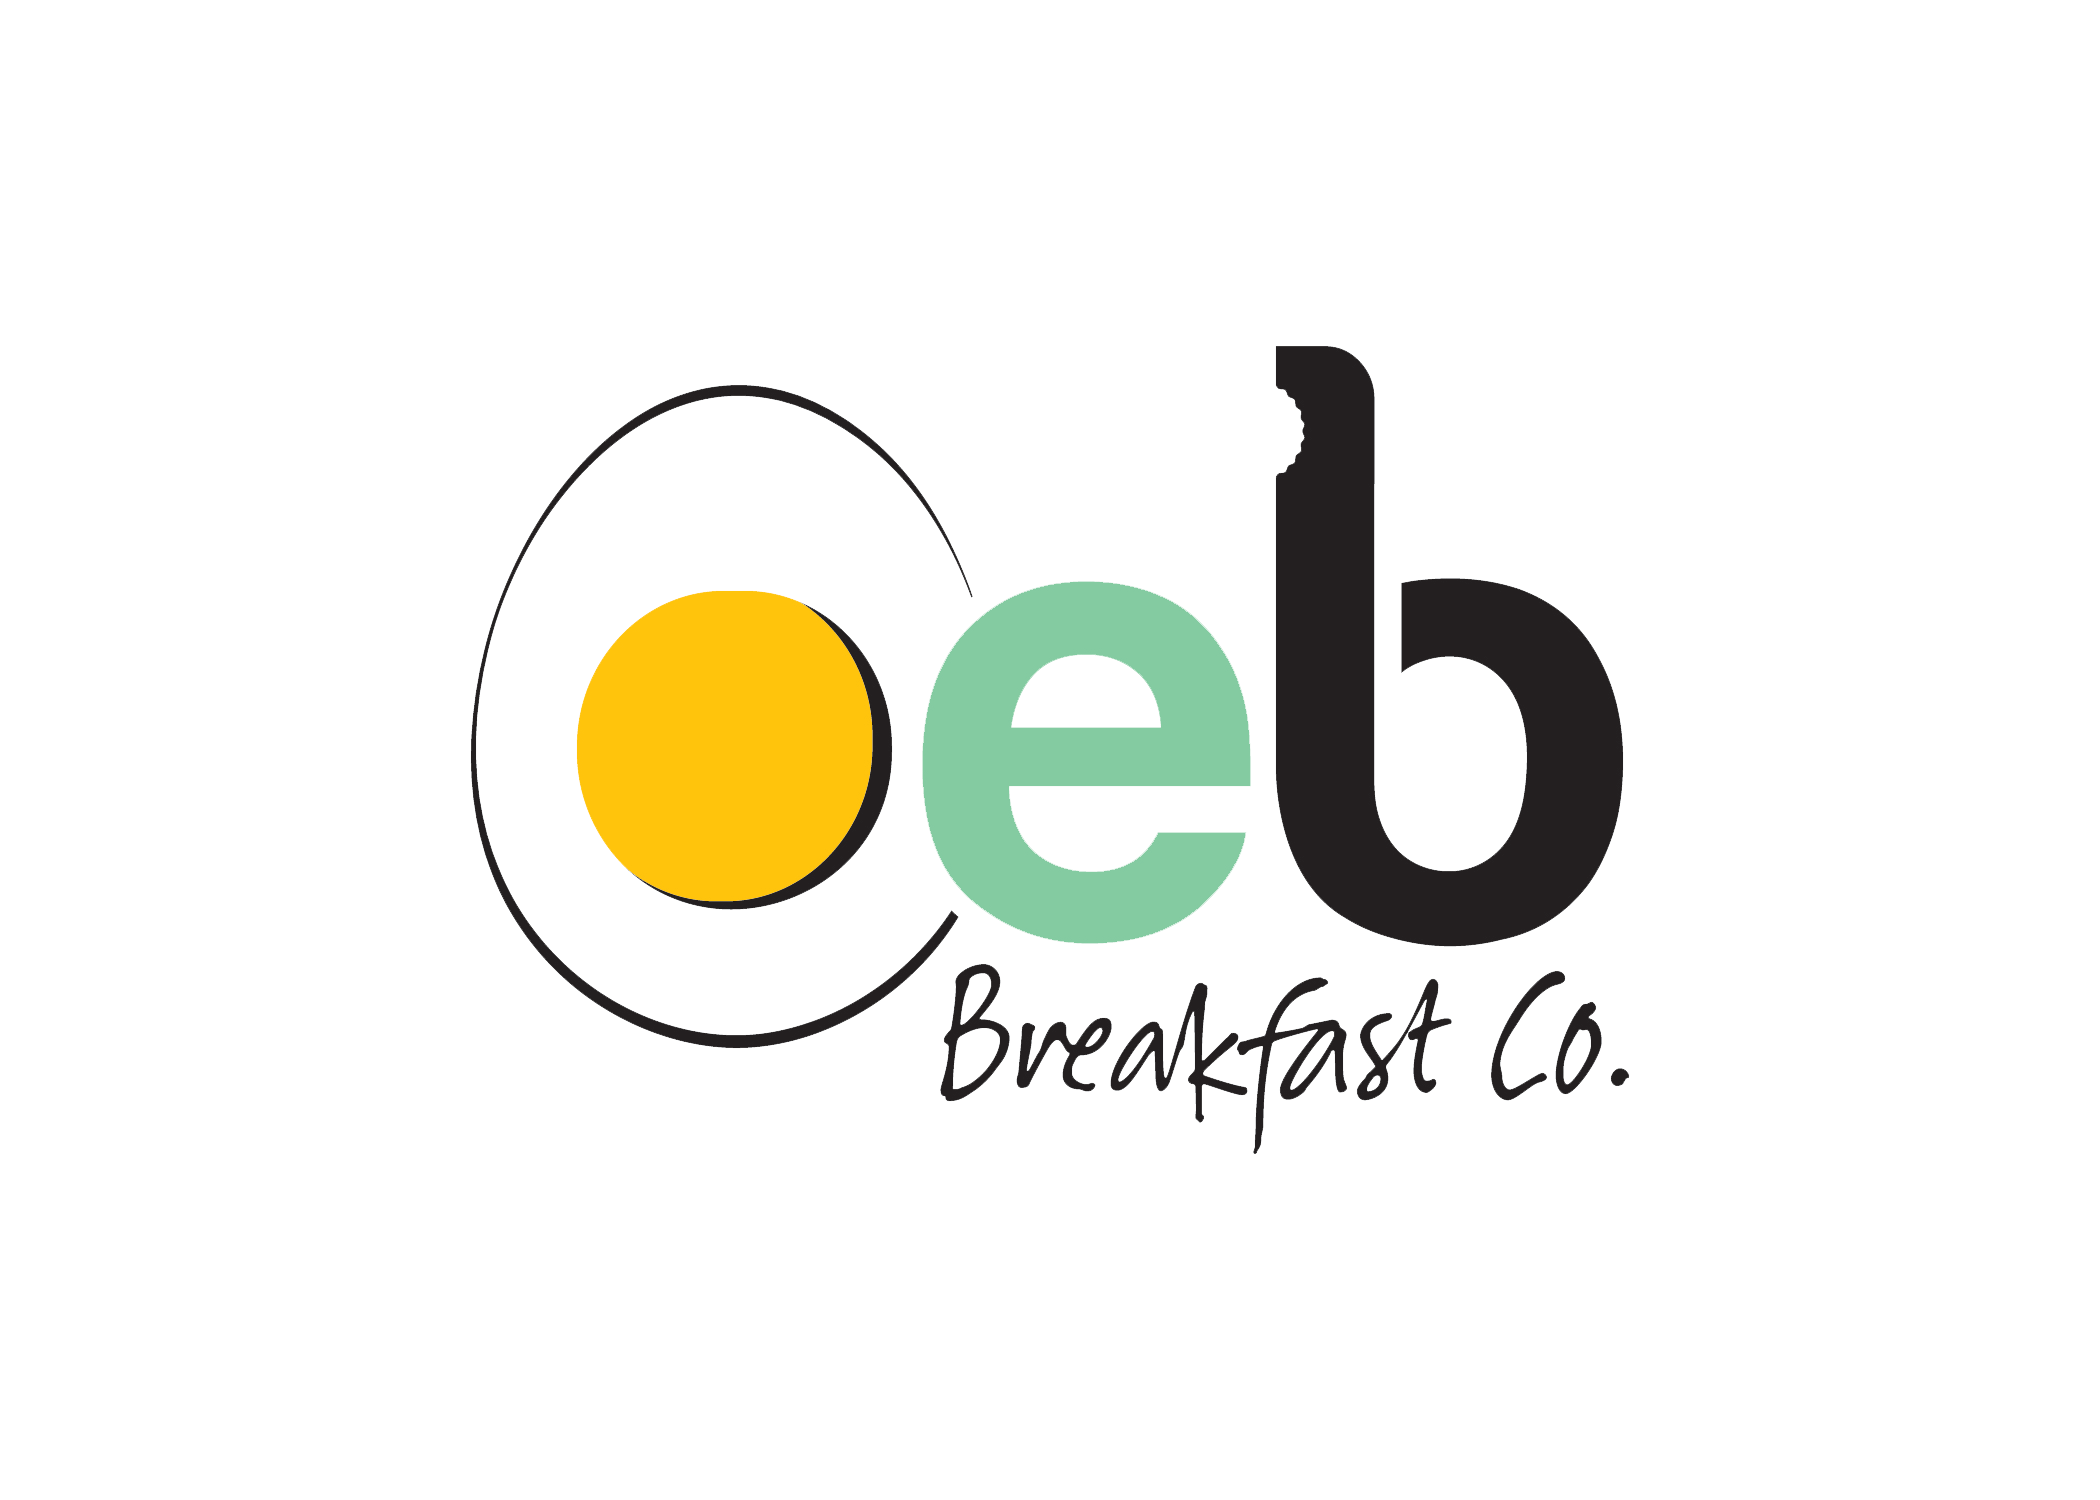 OEB Breakfast Company